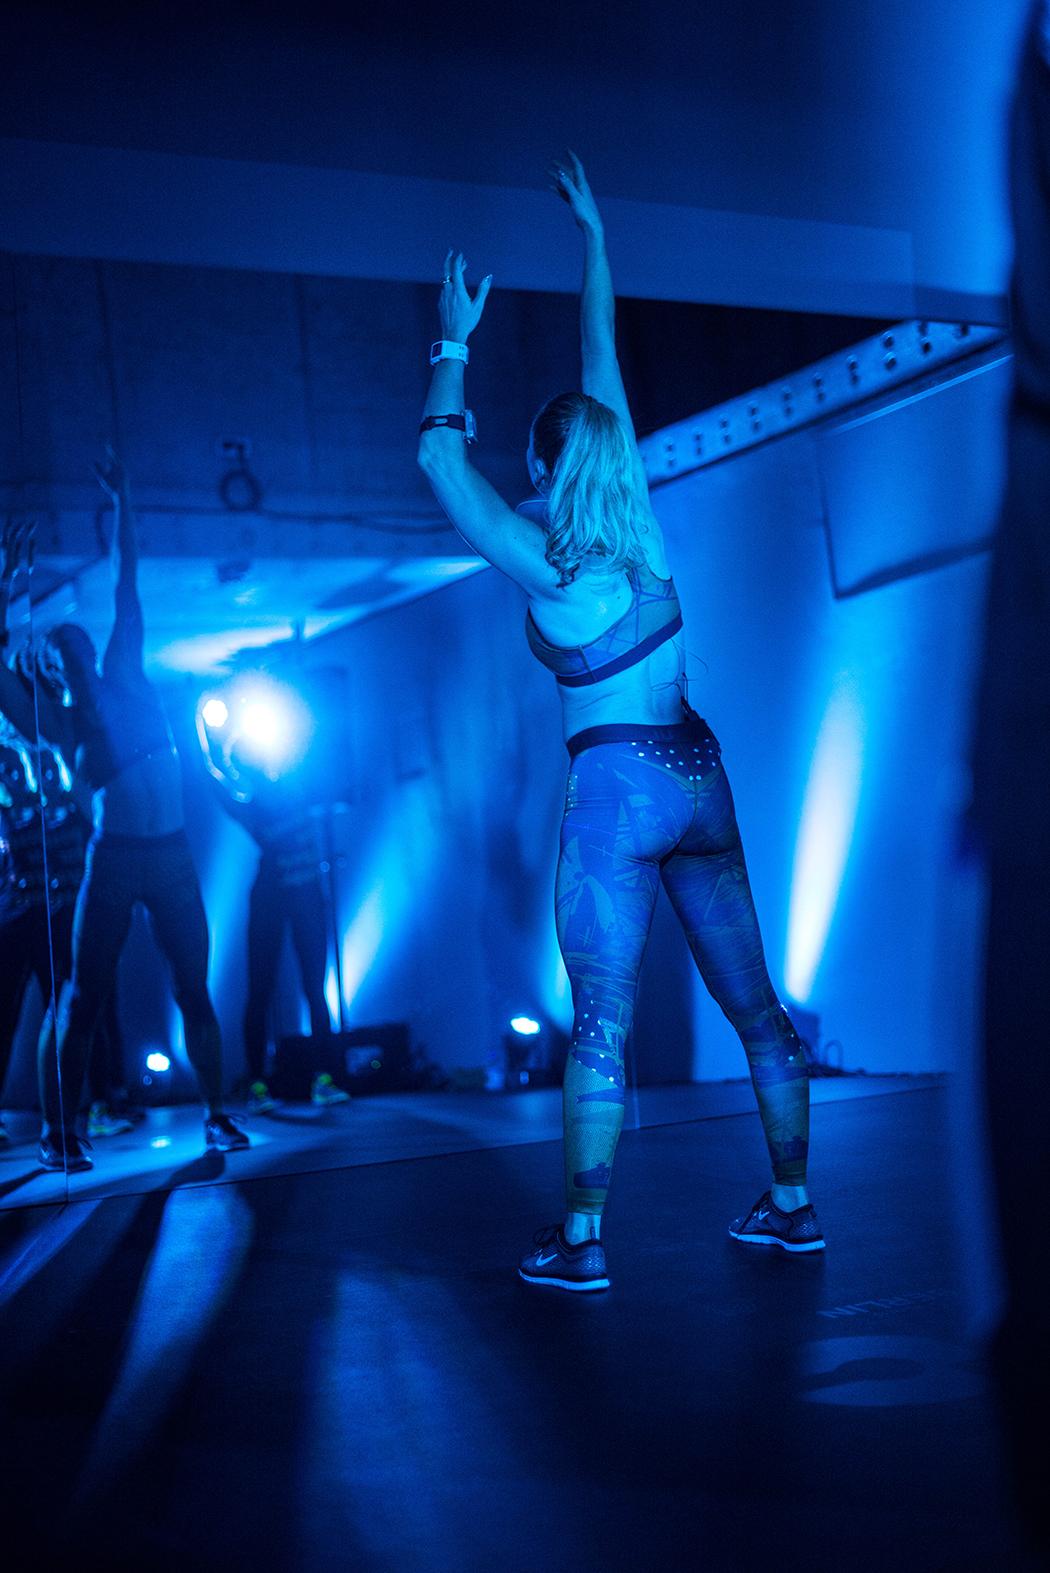 NTC-Event-Berlin-Blogger-Fashionblogger-Fitnessblogger-München-Berlin-Deutschland-Lindarella-5